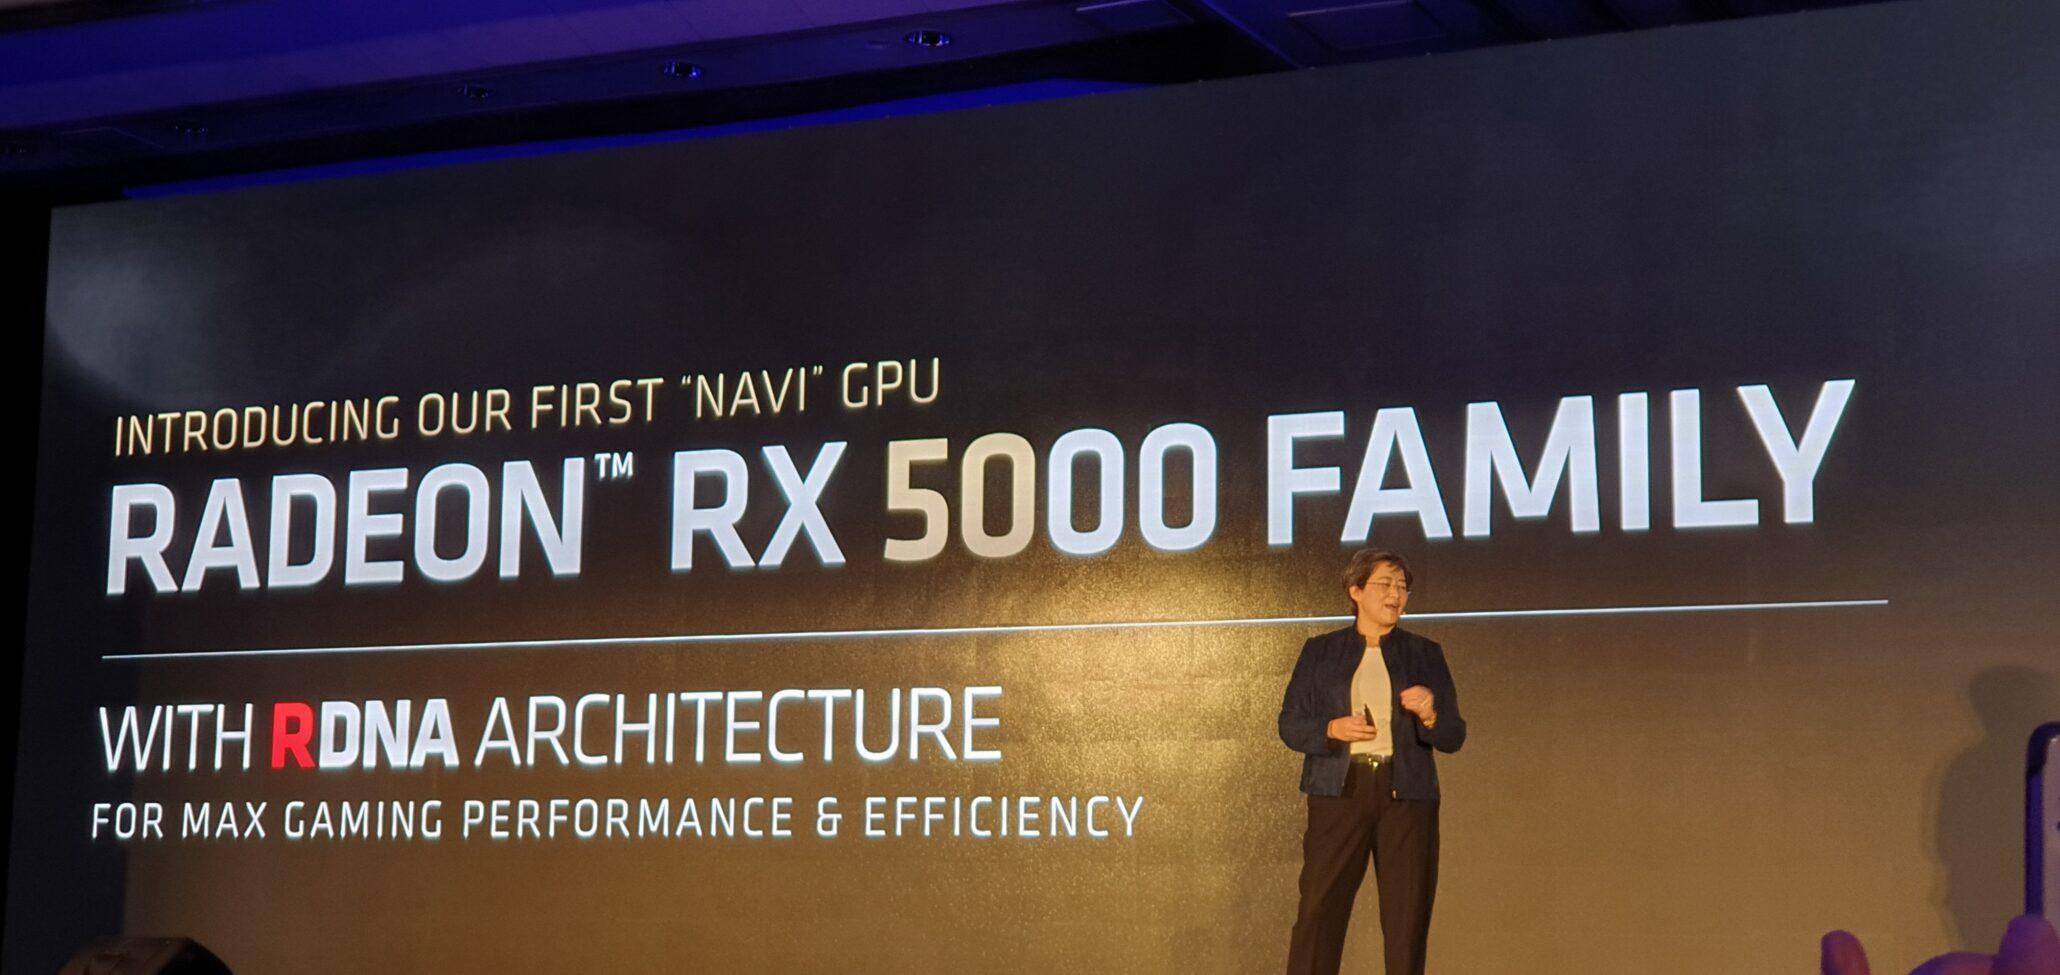 AMD Previews First 7nm Gaming Navi GPU: Radeon RX 5700 GPU